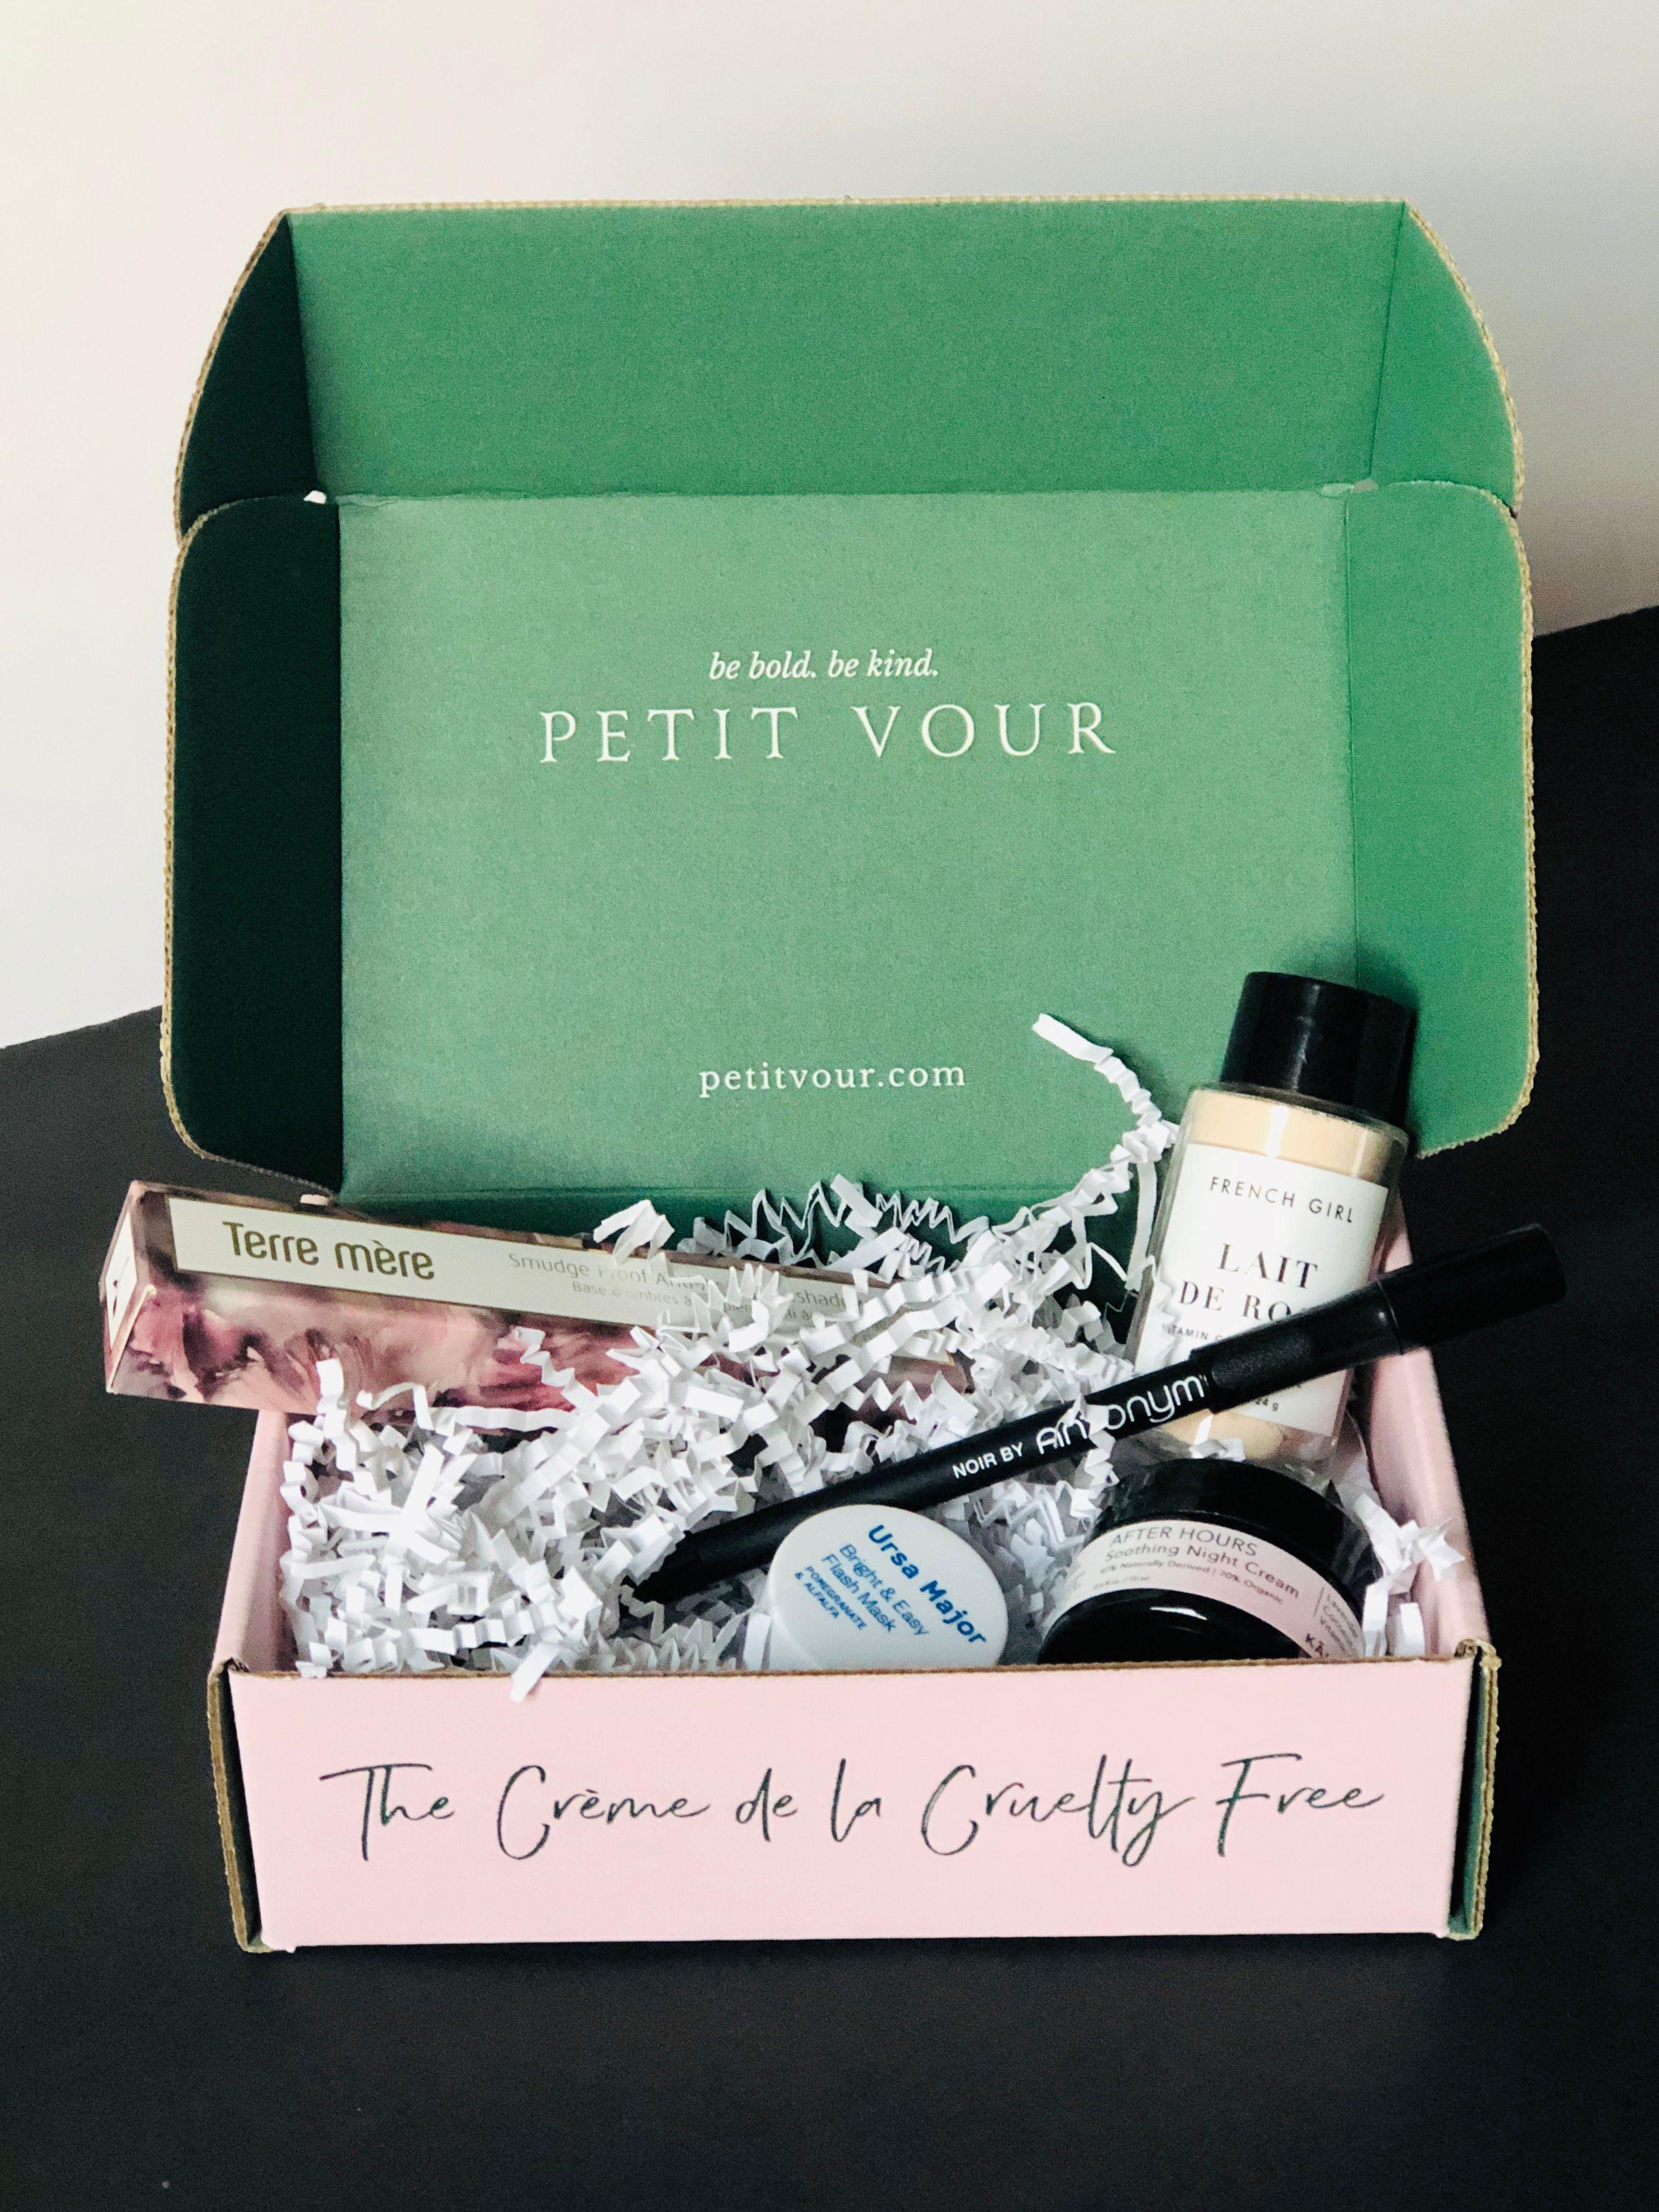 An Affordable Vegan & CrueltyFree Beauty Subscription Box